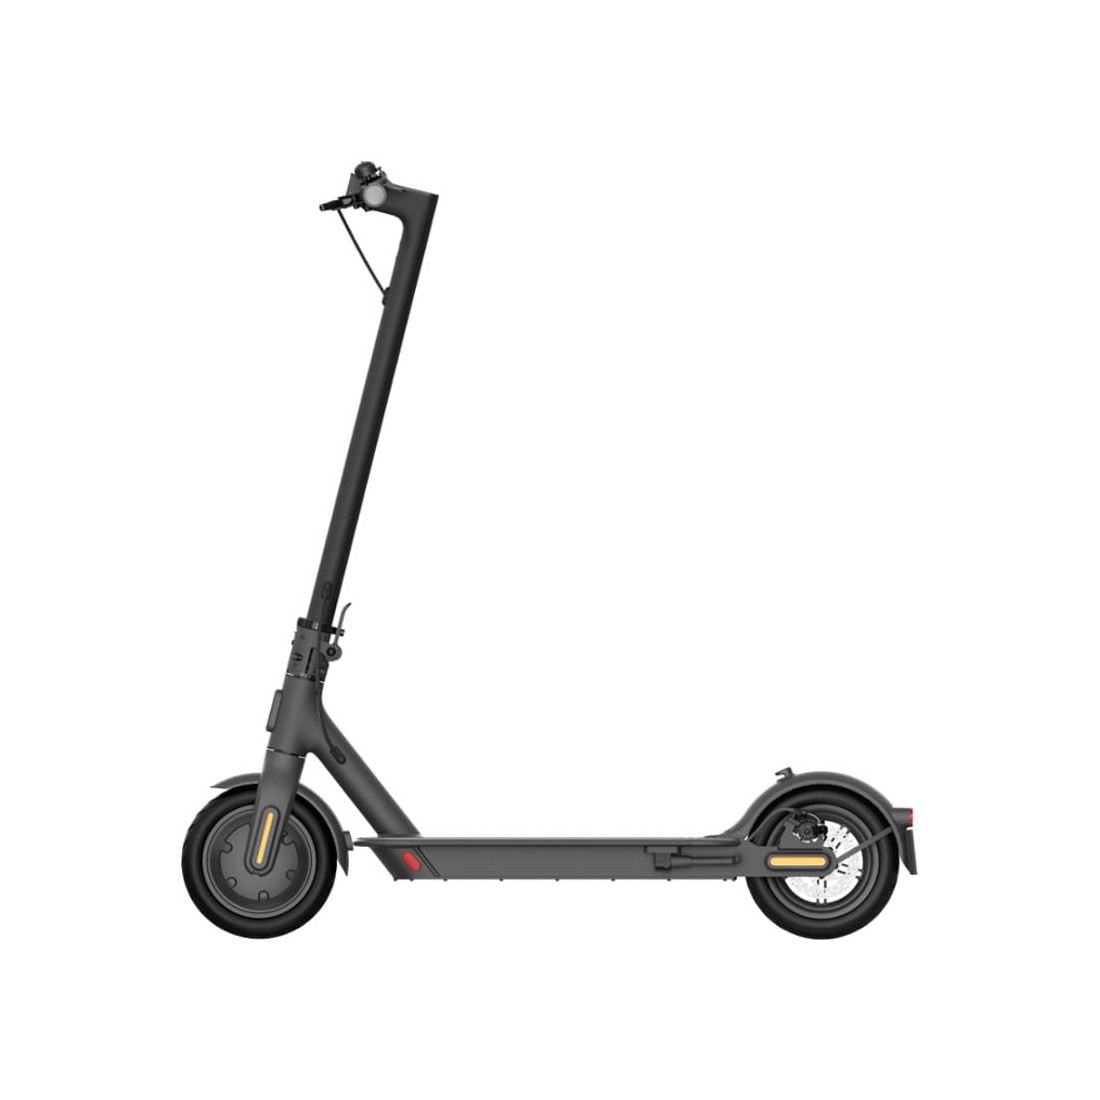 Электросамокат Xiaomi MiJia Smart Electric Scooter Essential - фото 2